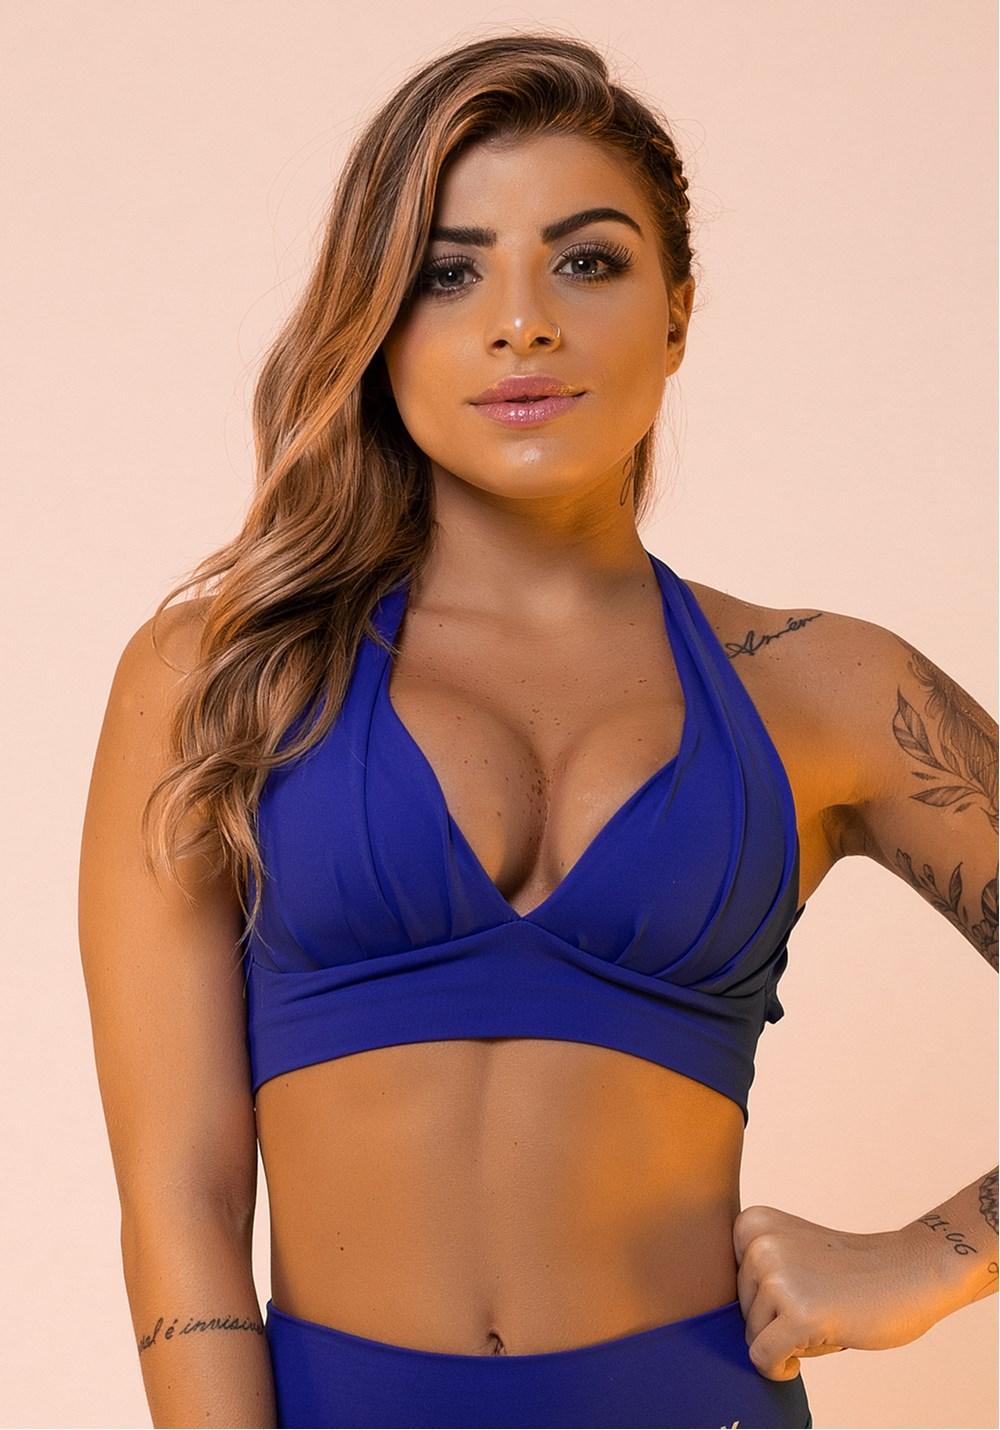 Top fitness drapeado azul royal com bojo